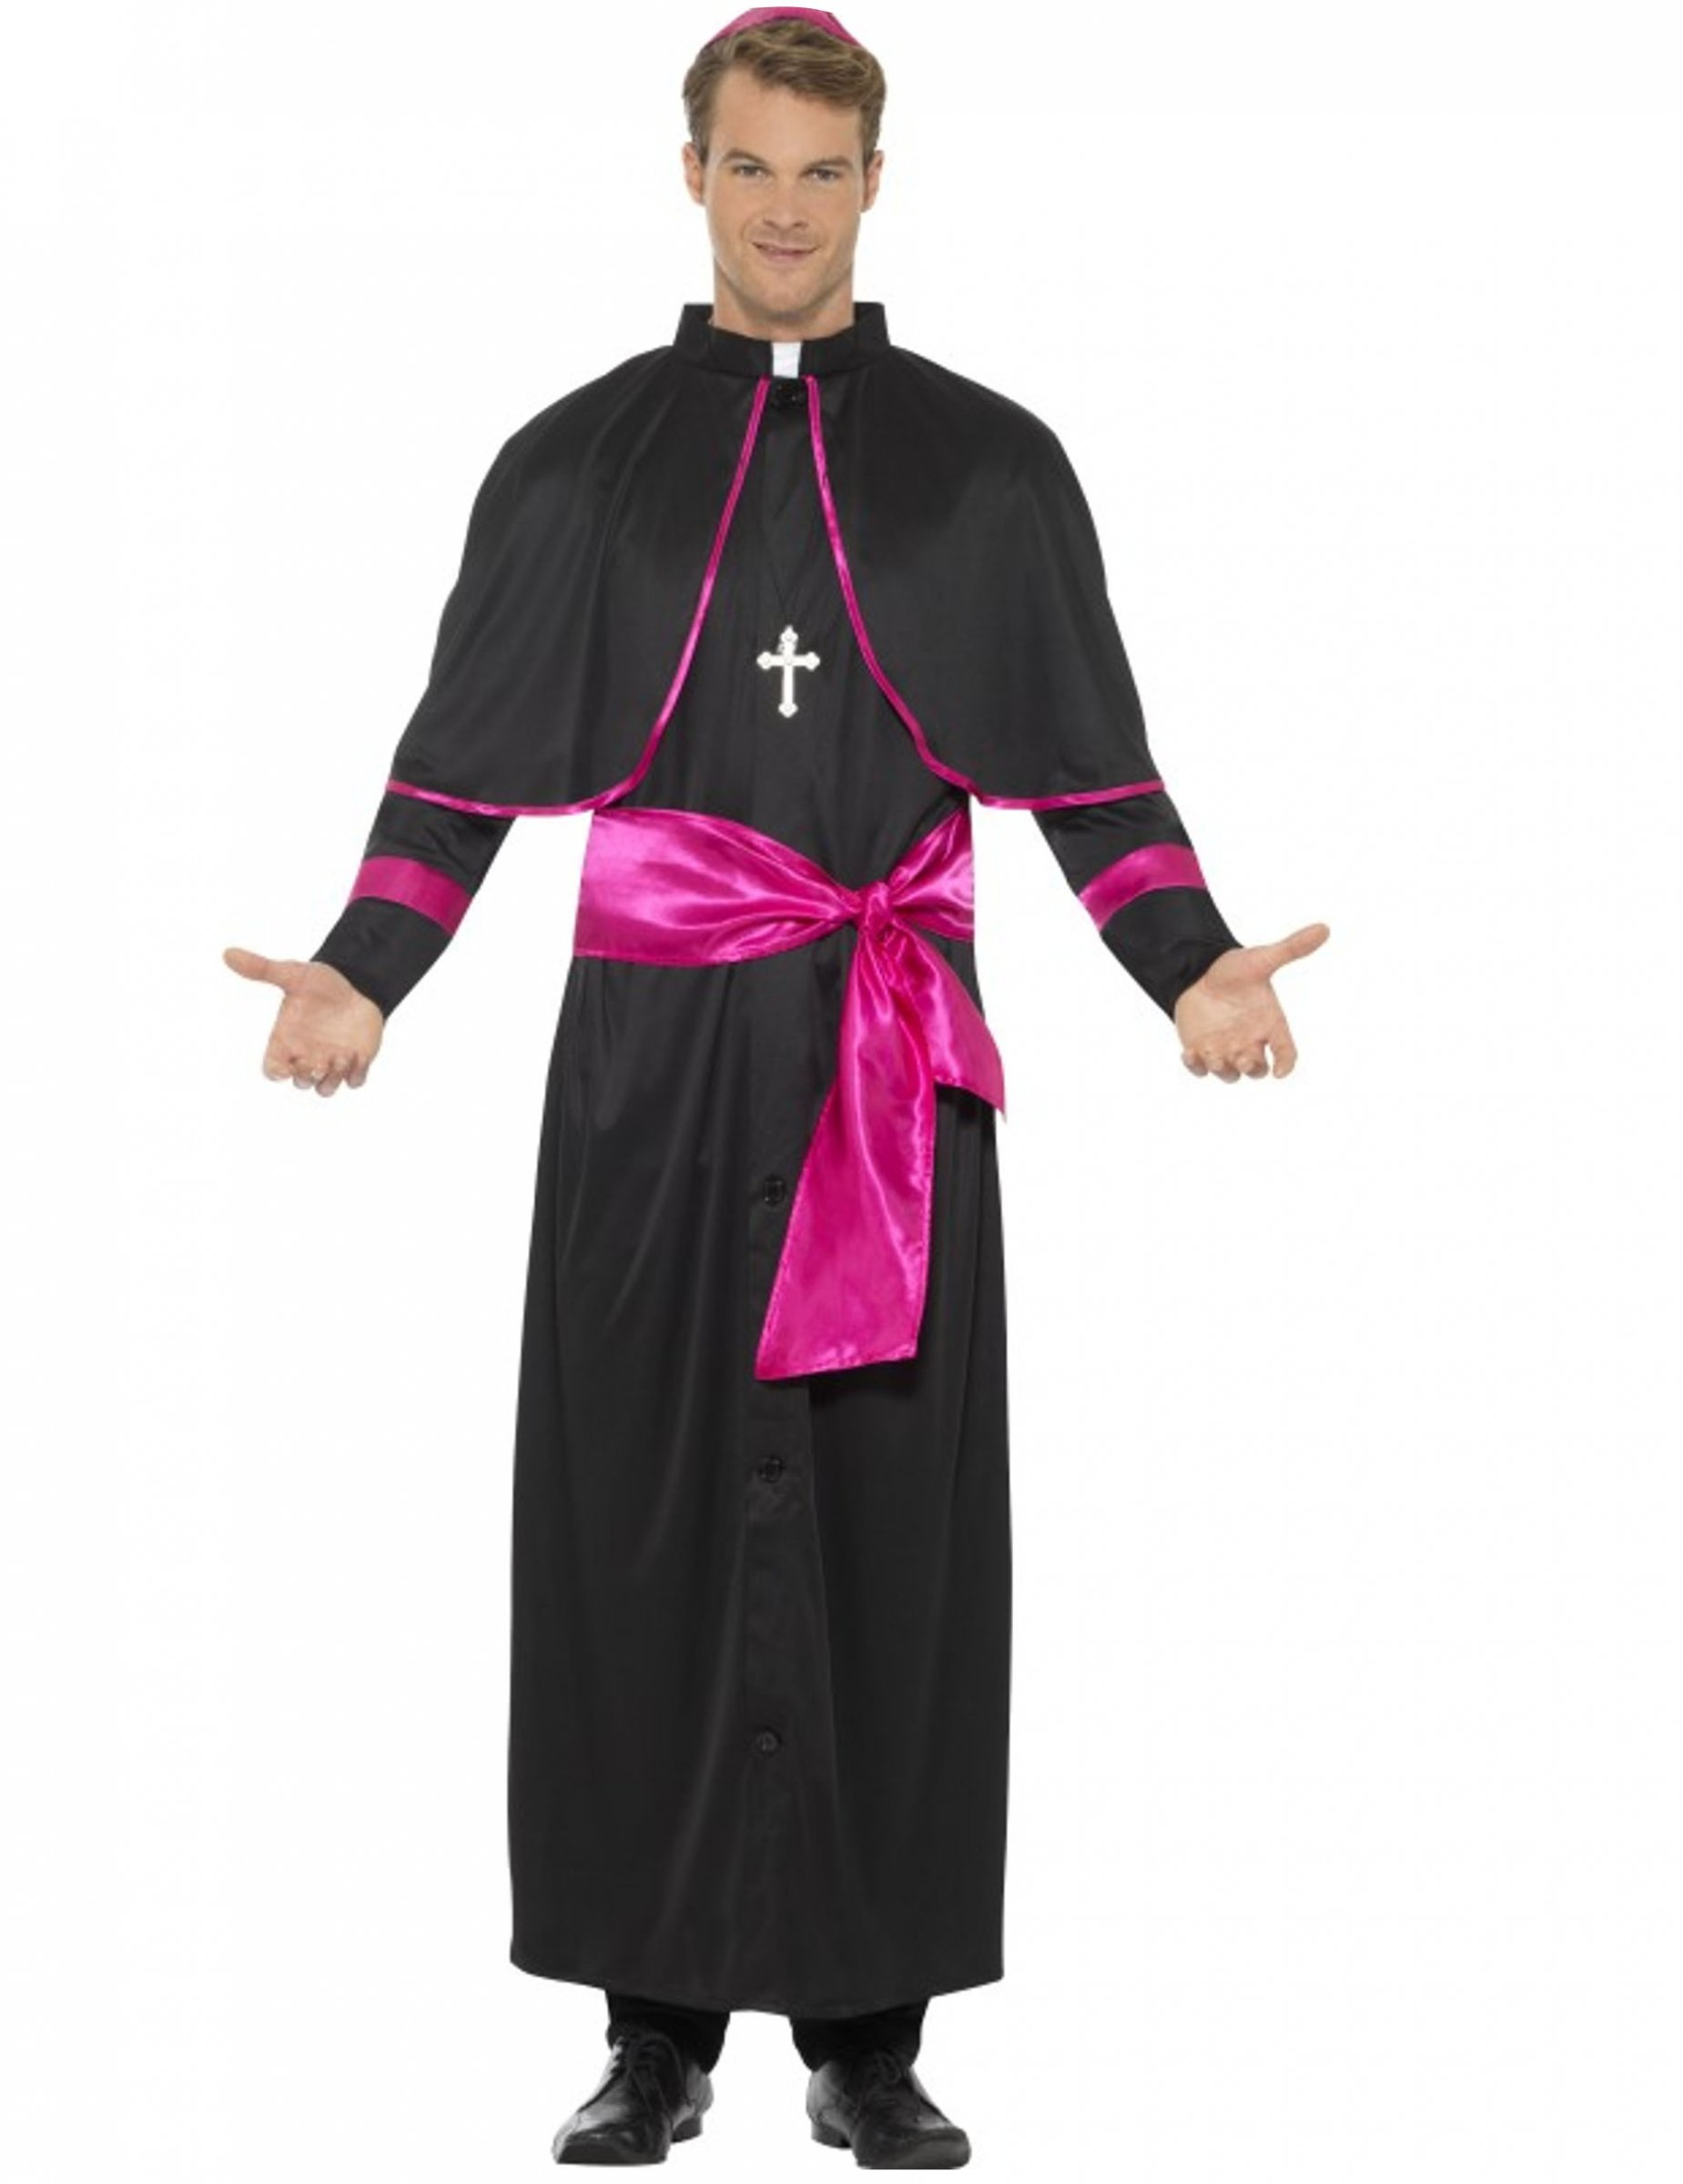 Costume da cardinale per uomo  Costumi adulti 9a94dadb3df